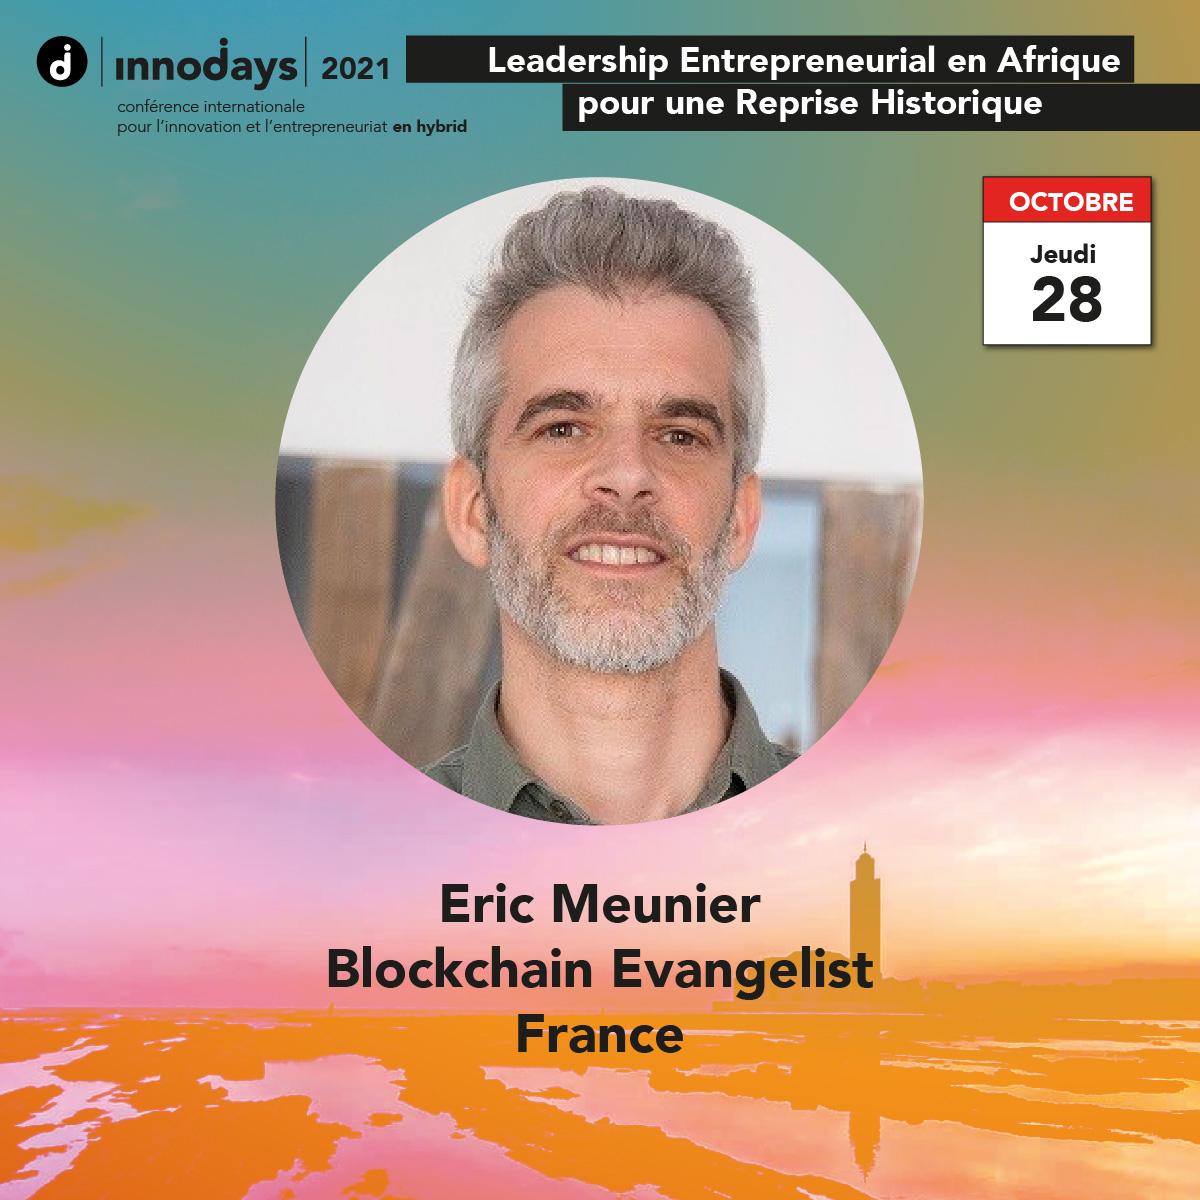 Eric Meunier - Blockchain Evangelist - France